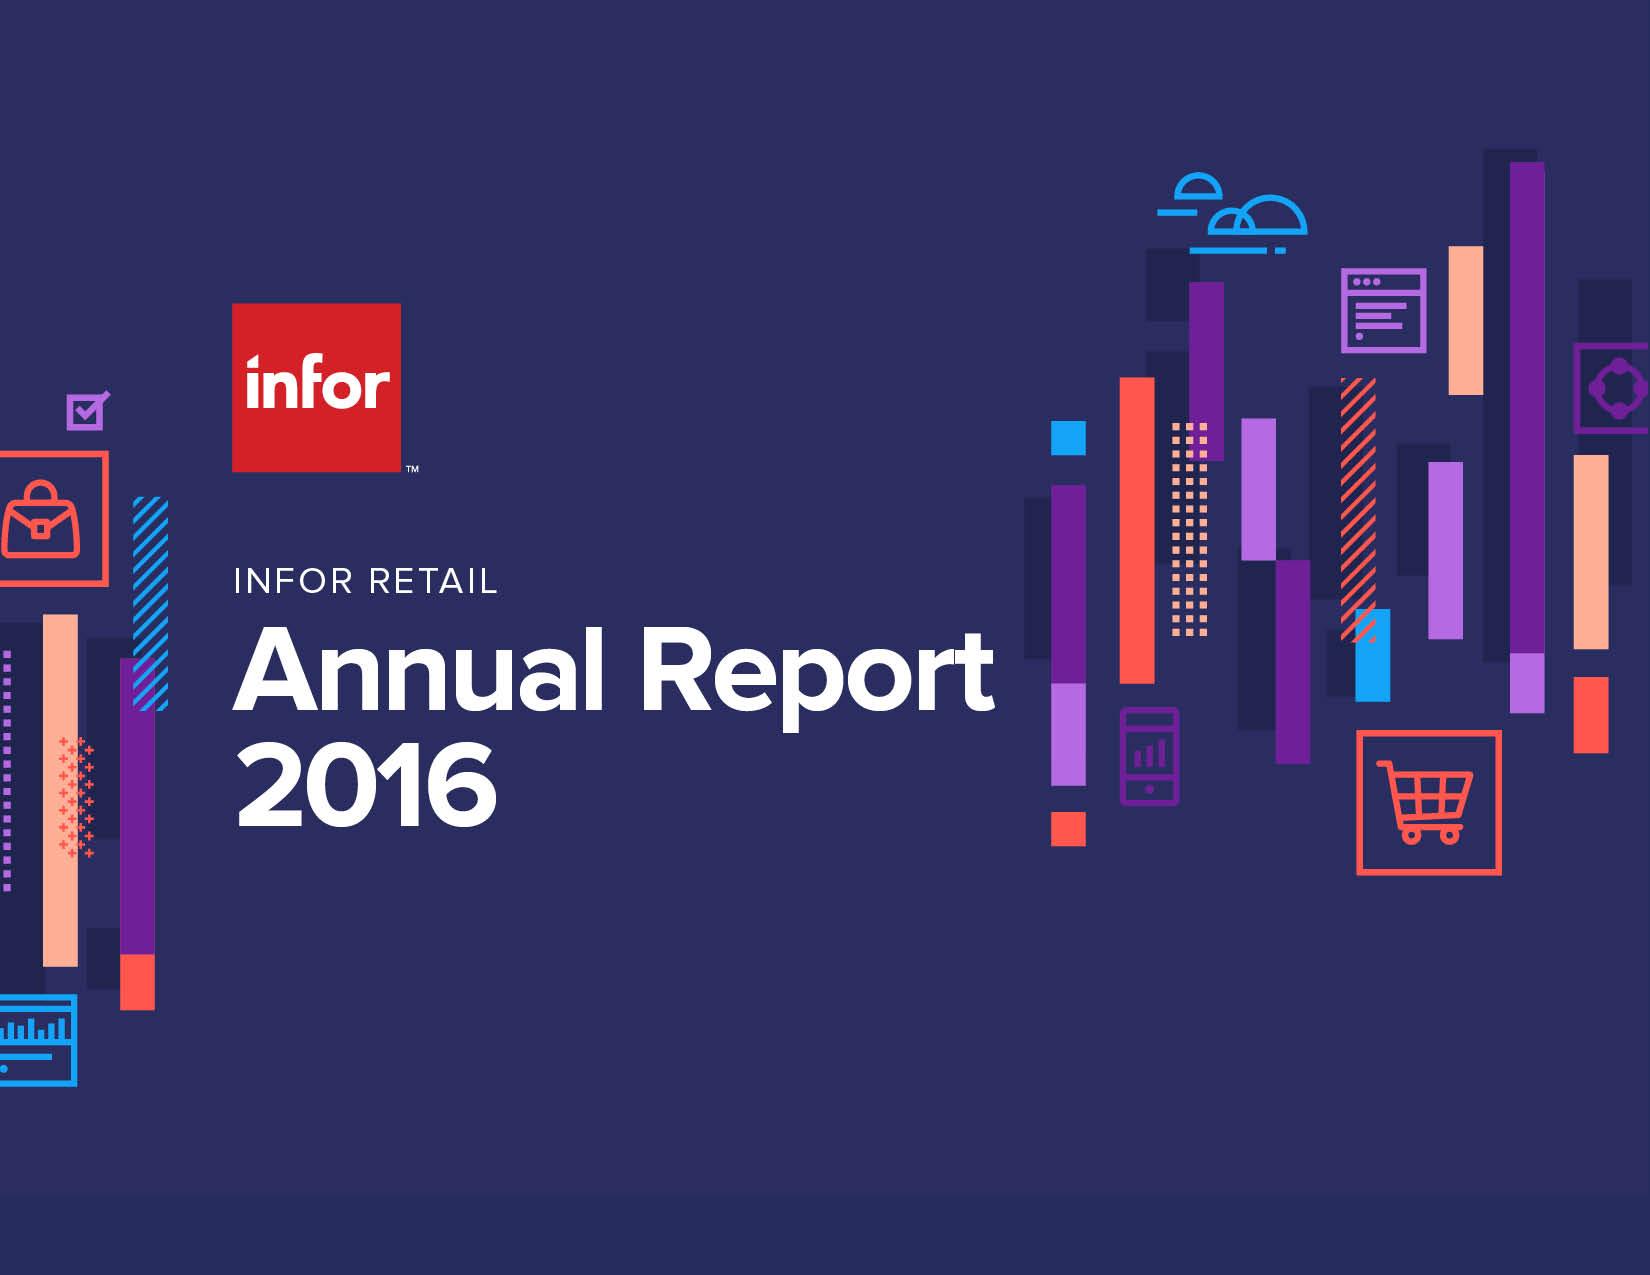 InforRetail_AnnualReport_2016.jpg